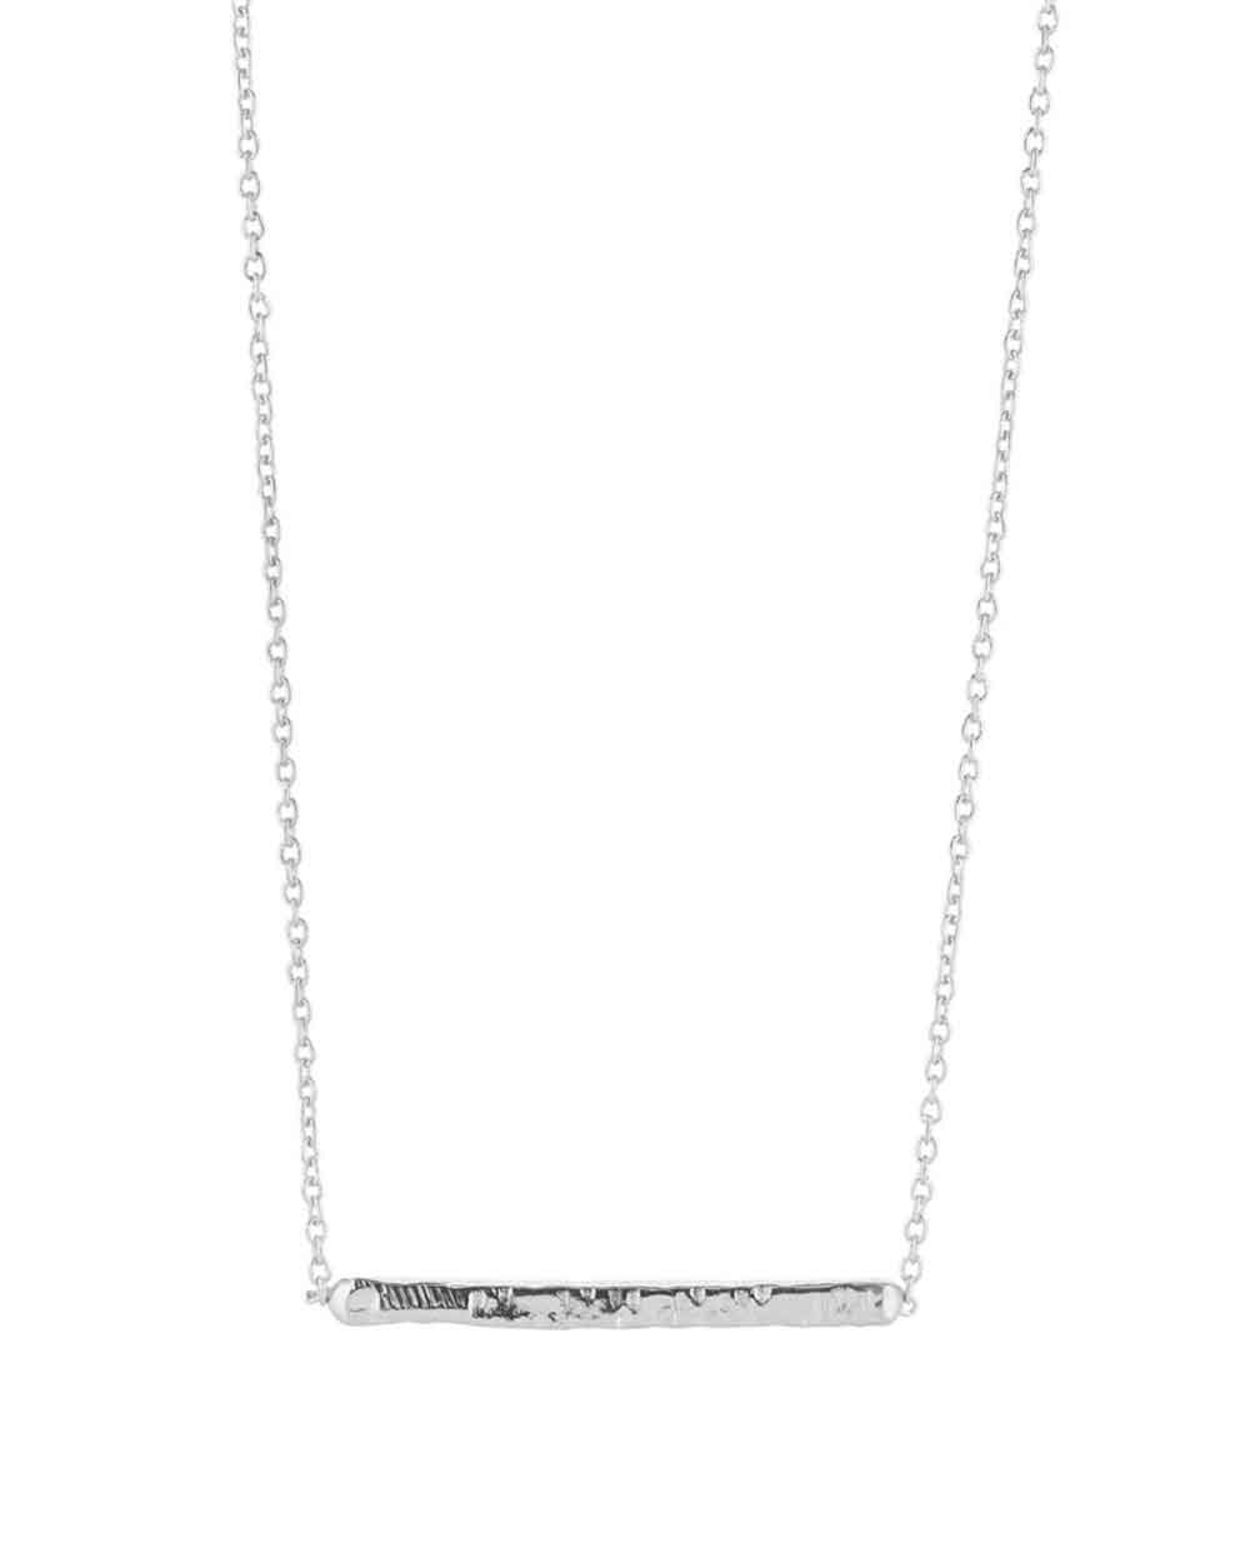 Short Silver Hammered Bar Necklace